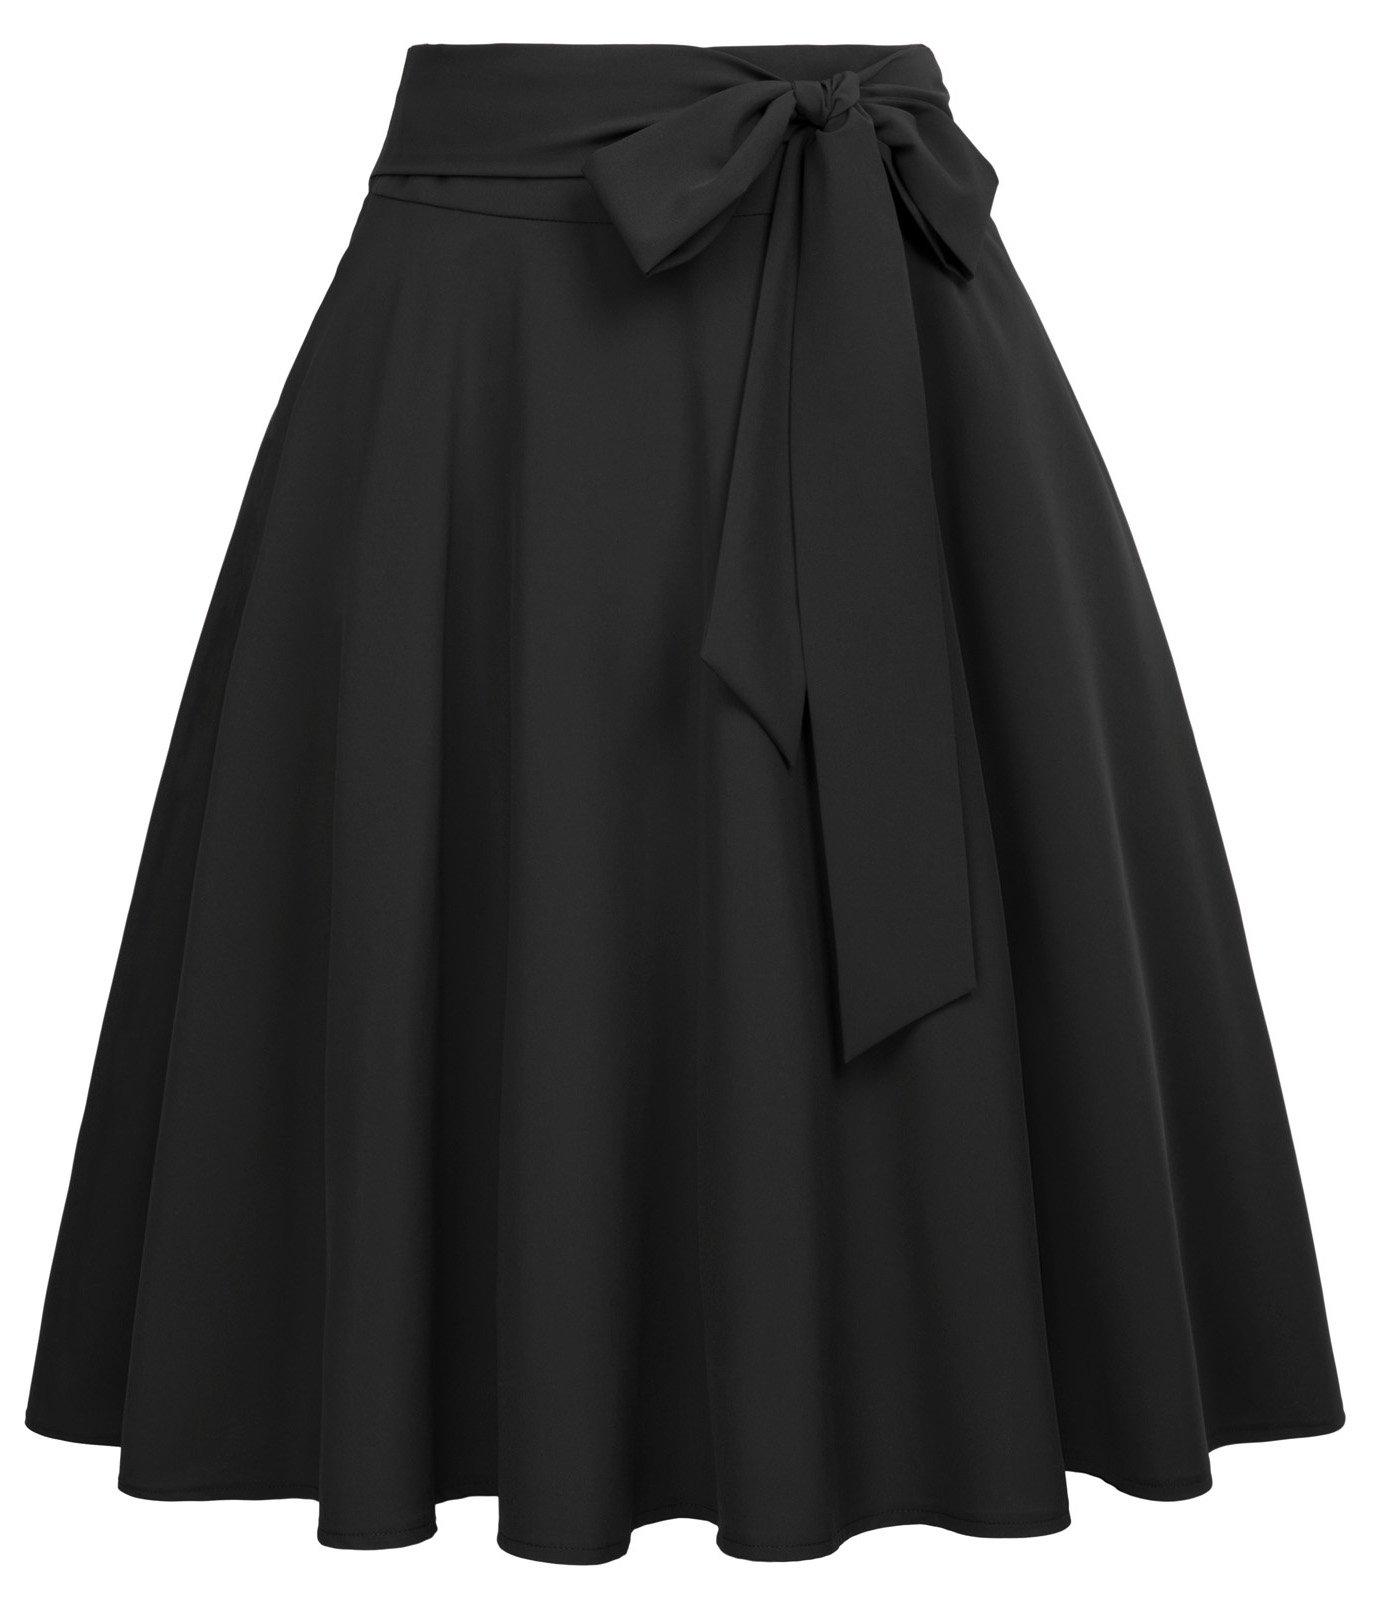 Women's High Waisted A Line Street Skirt Pleated Midi Skirt Black-1 Size S BP561-1